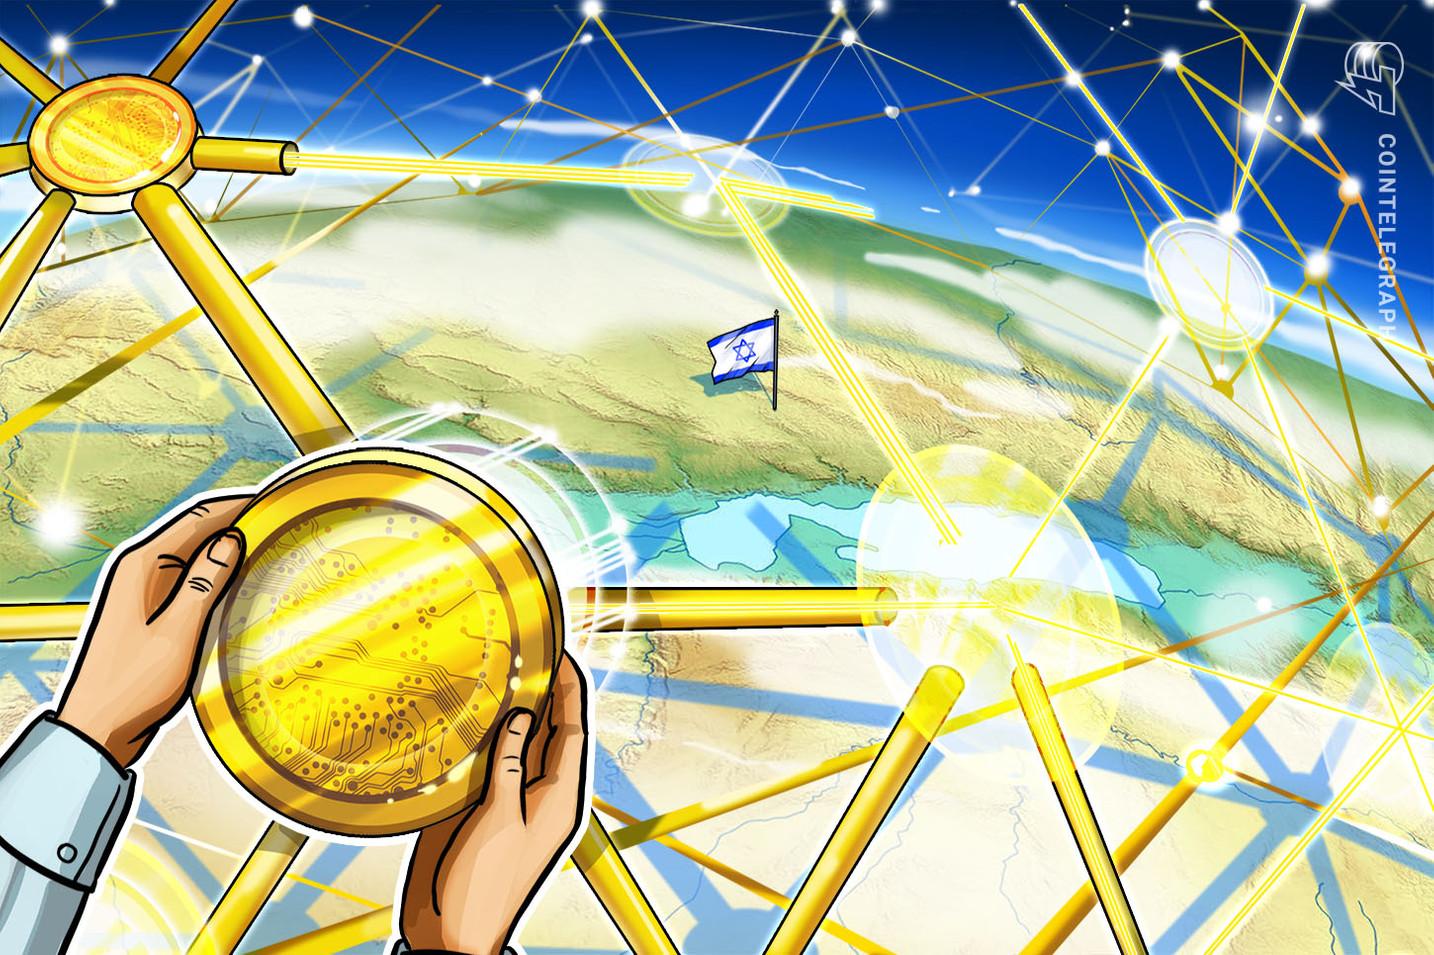 Israeli Regulators Request Feedback to Foster Blockchain Innovation